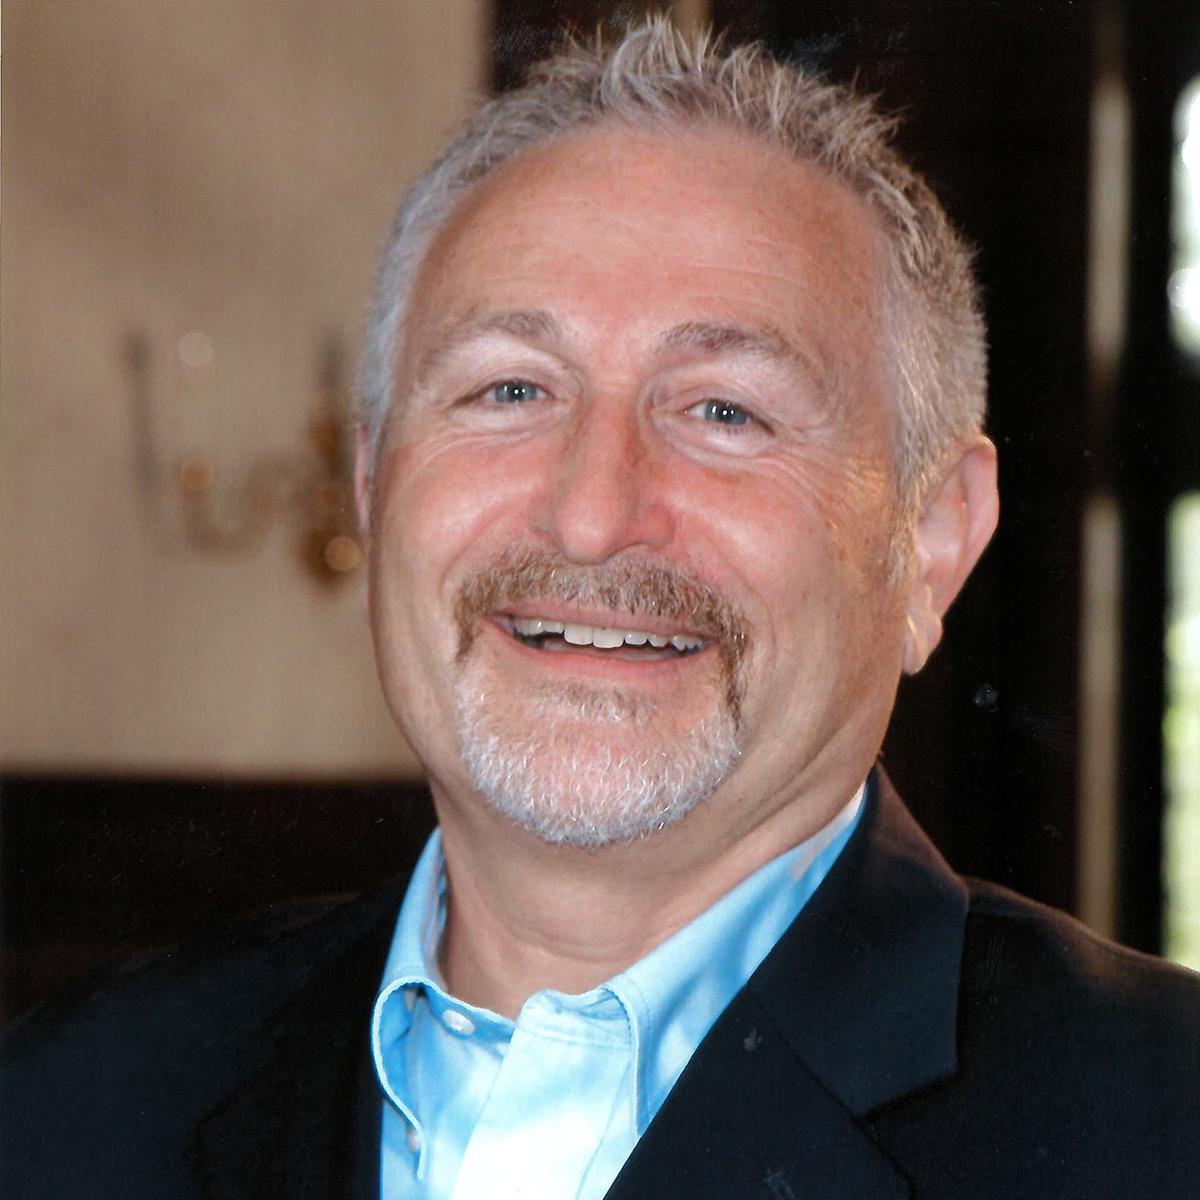 Theodore Beltavski DAA 2017